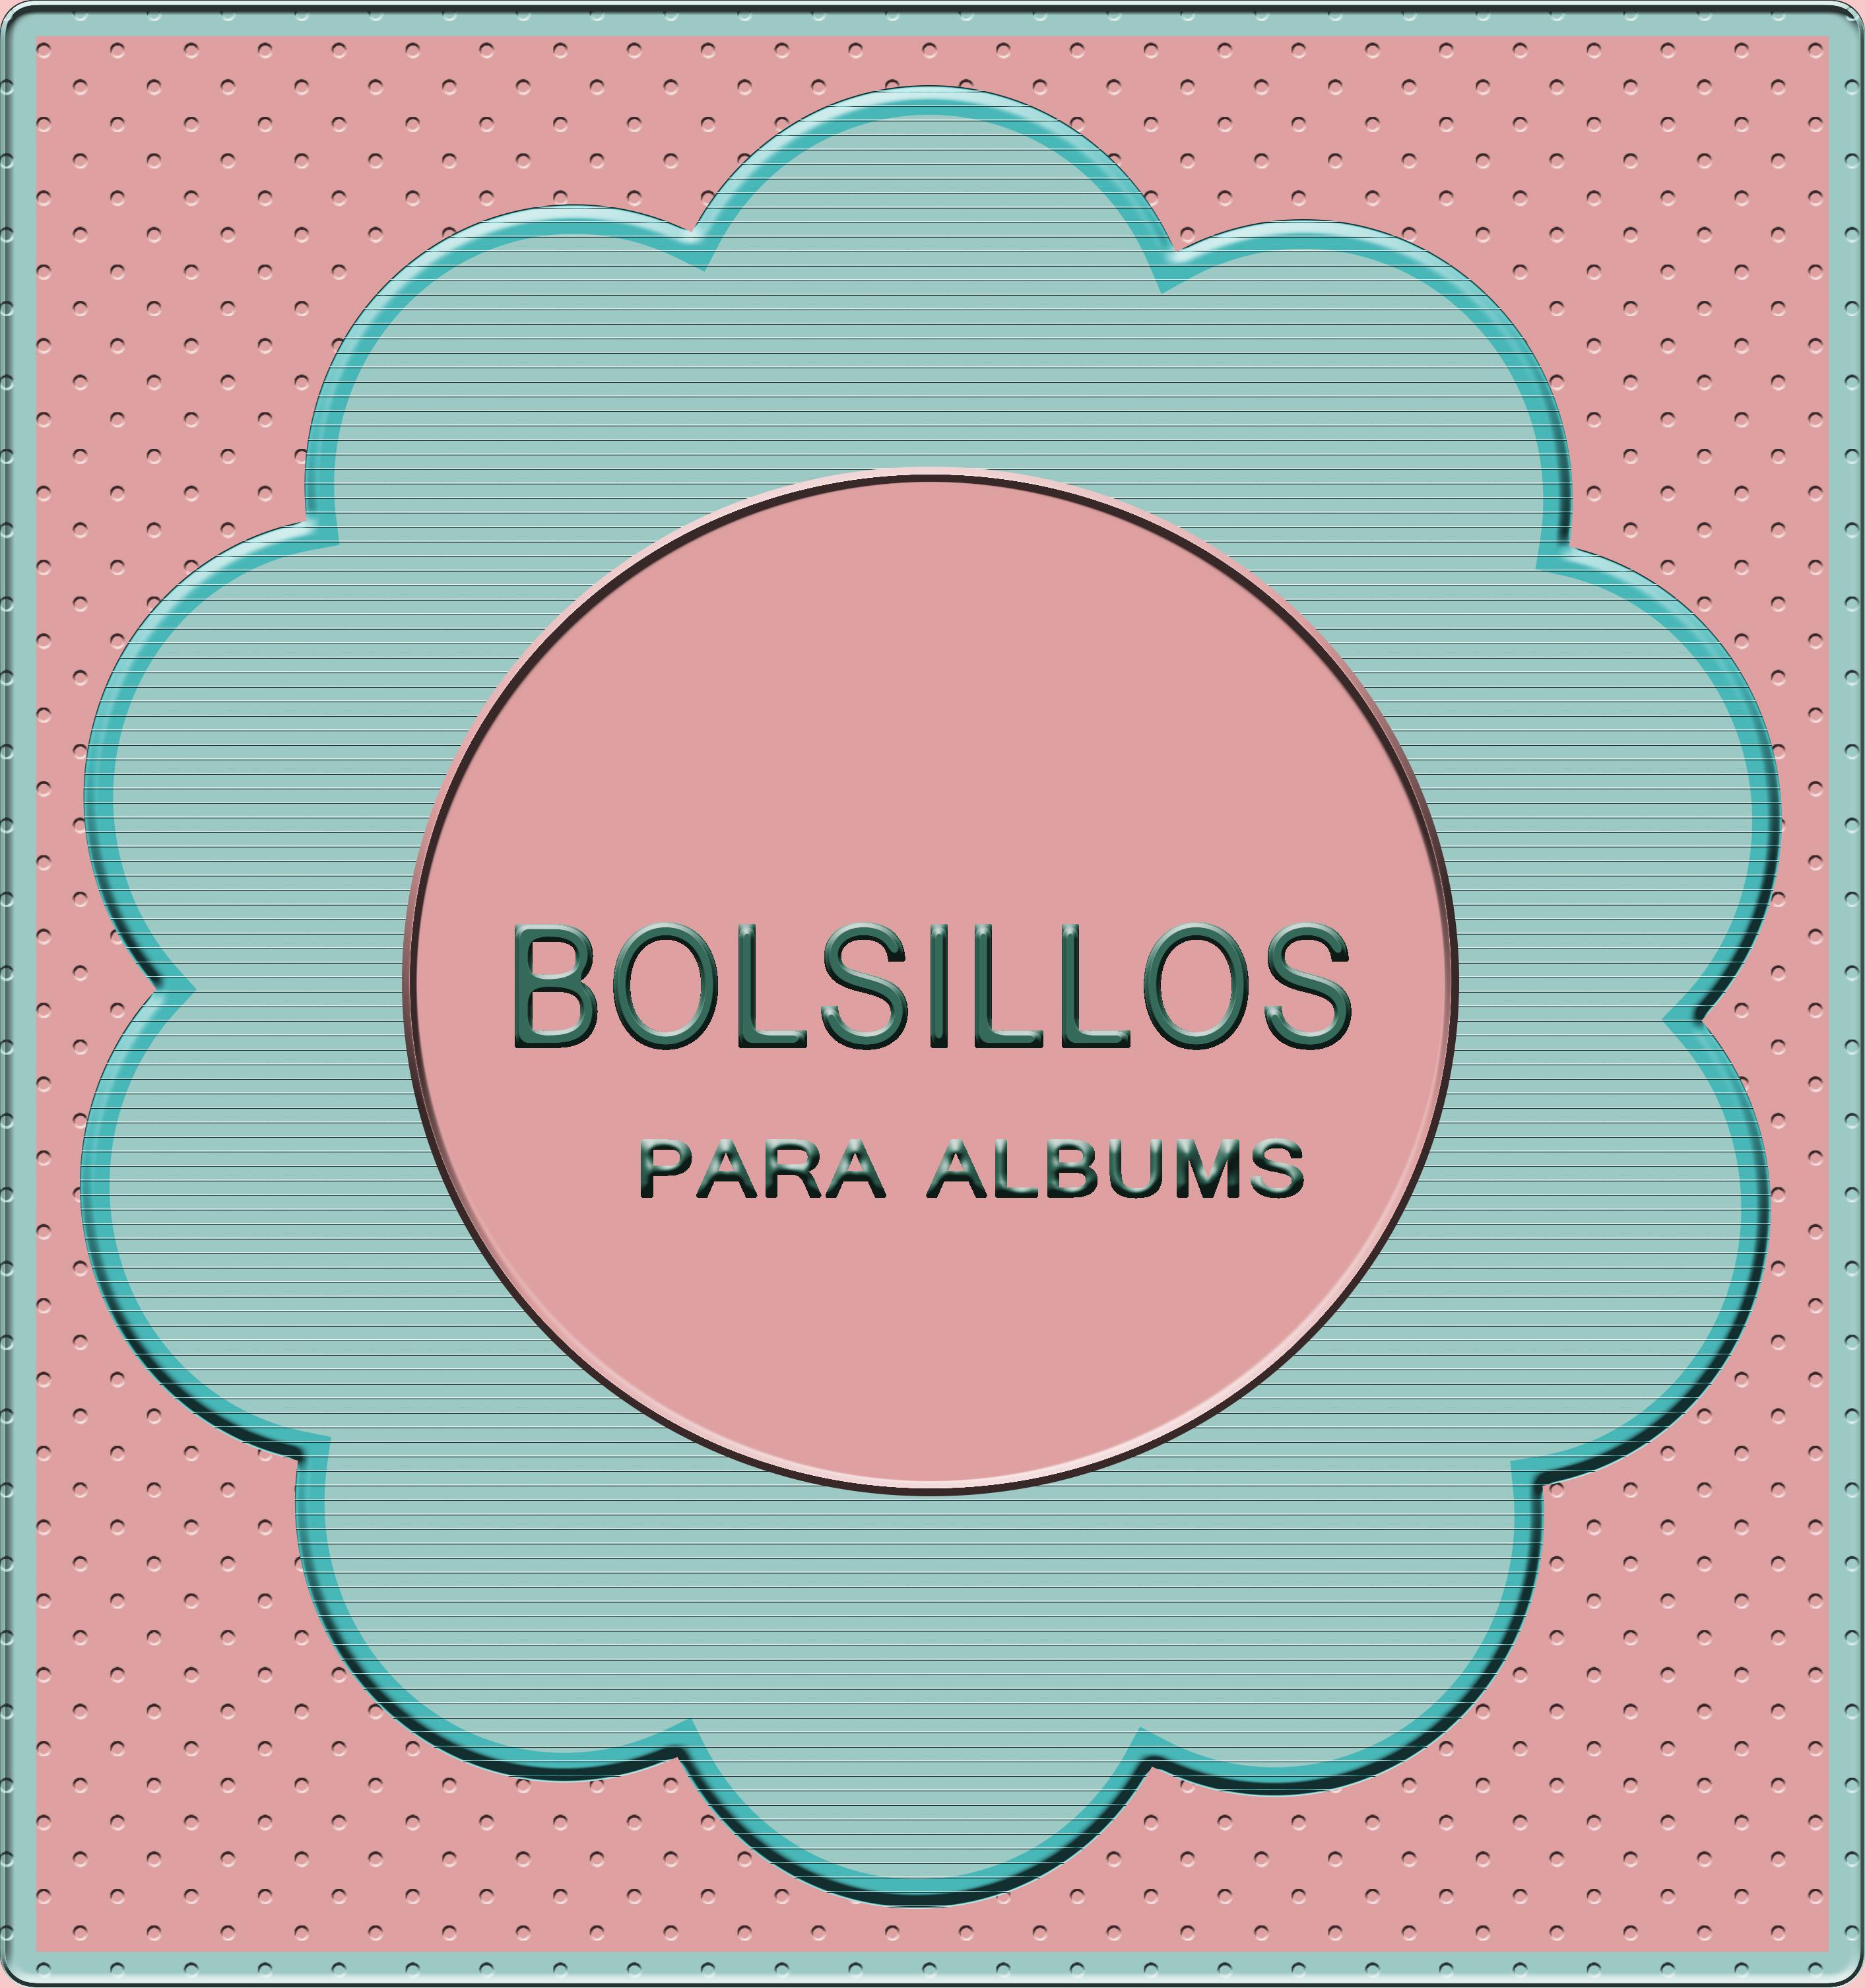 Bolsillos para mini albums de scrapbooking | Anascrapmola